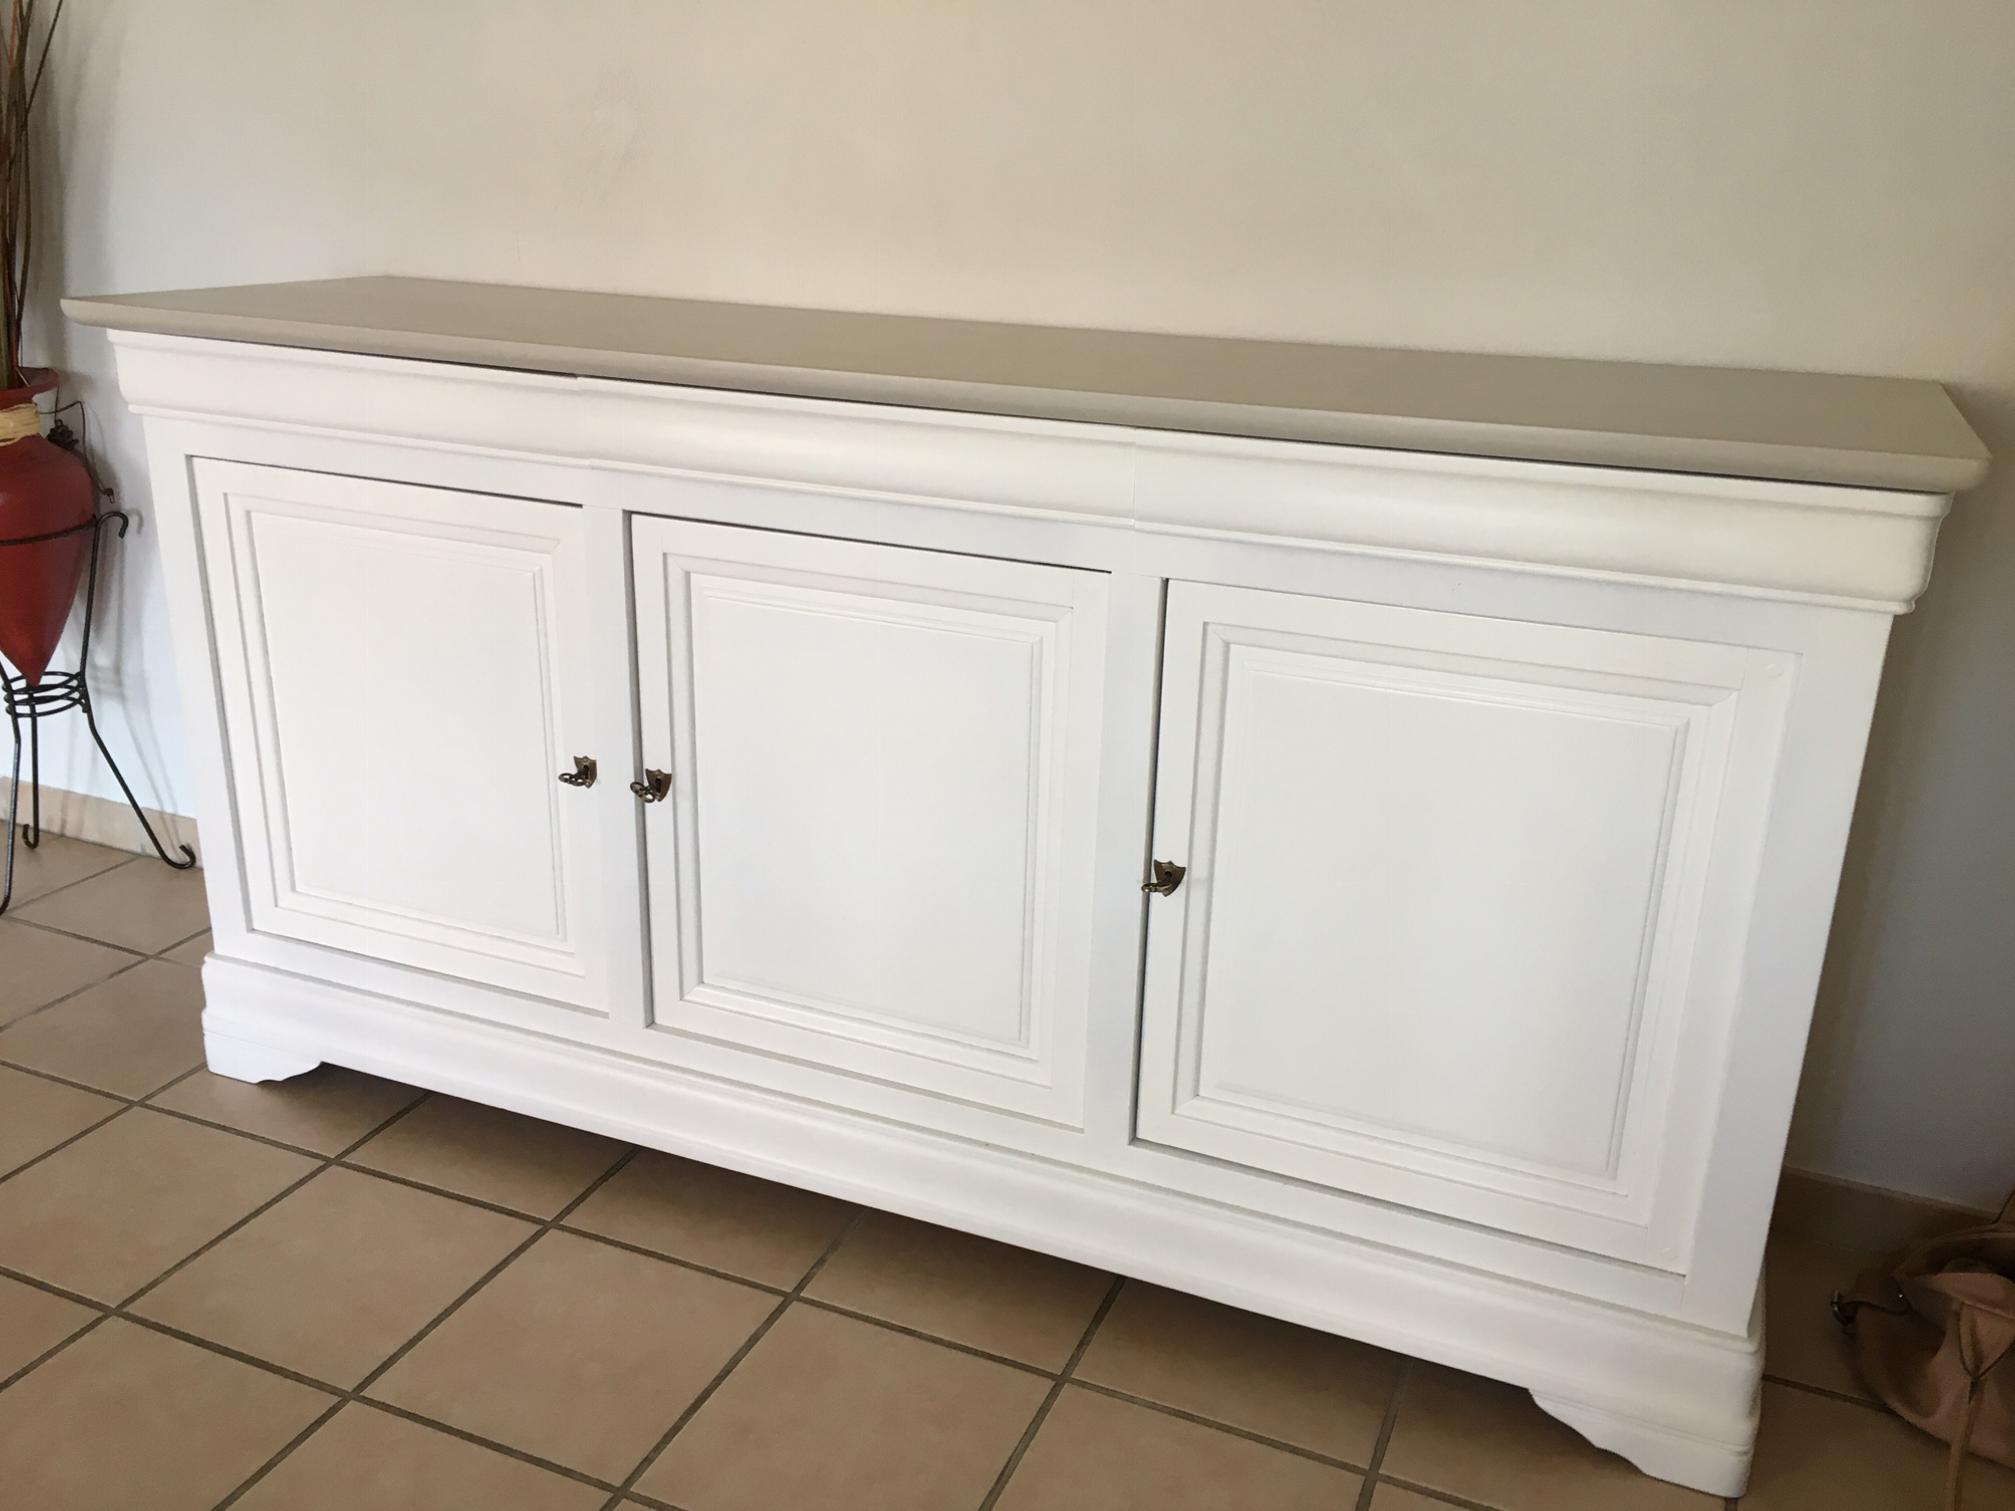 R alisations enfilade louis philippe relook e en blanc - Repeindre meuble louis philippe ...